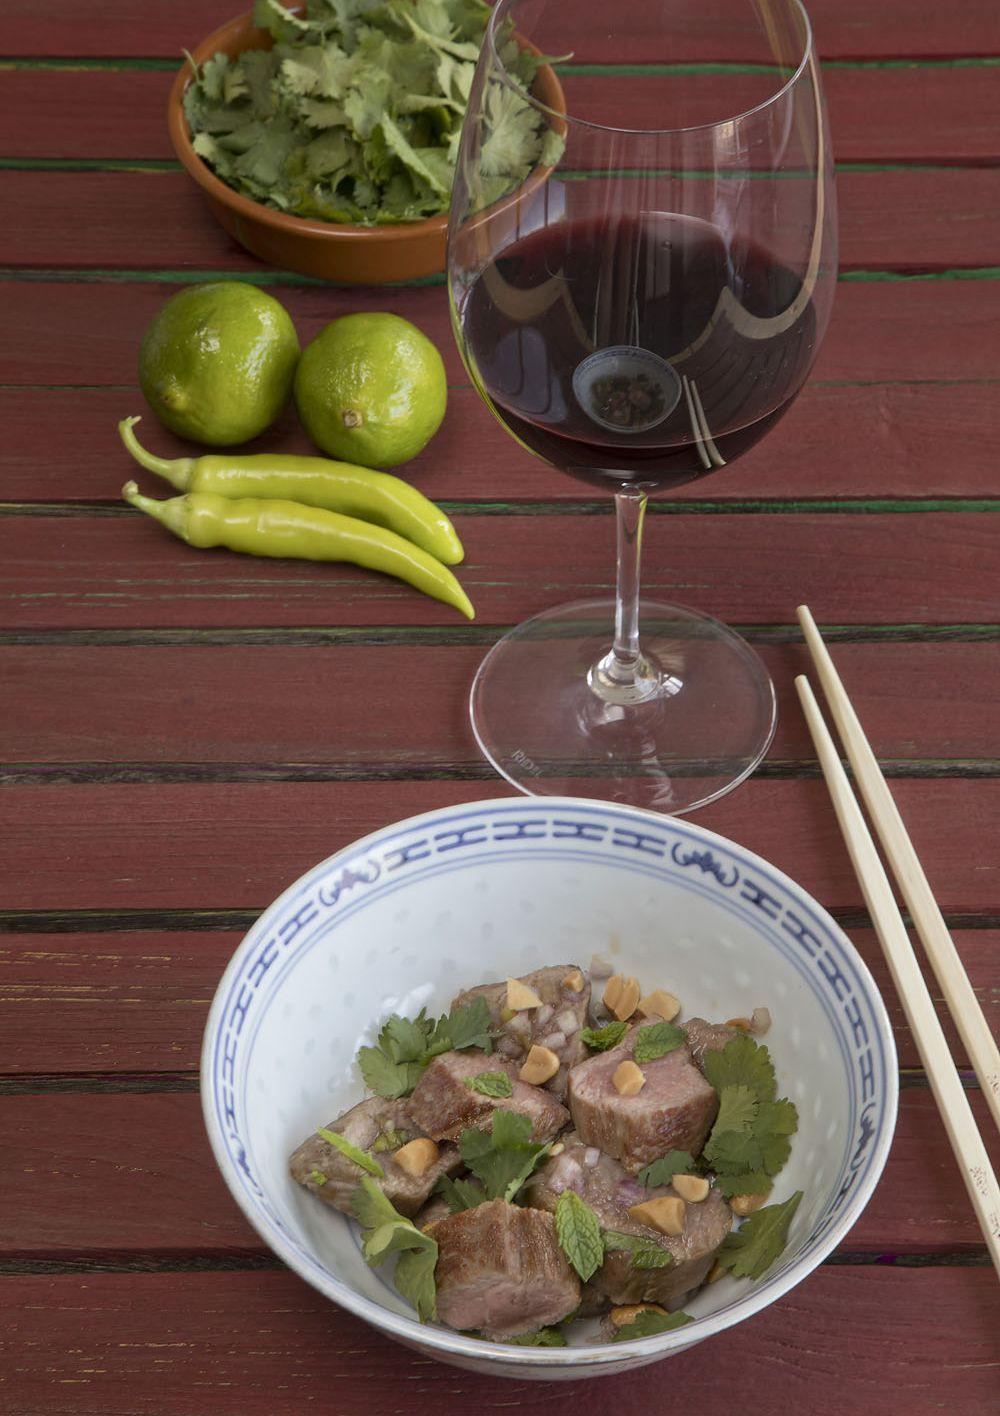 Thaise salade met lam